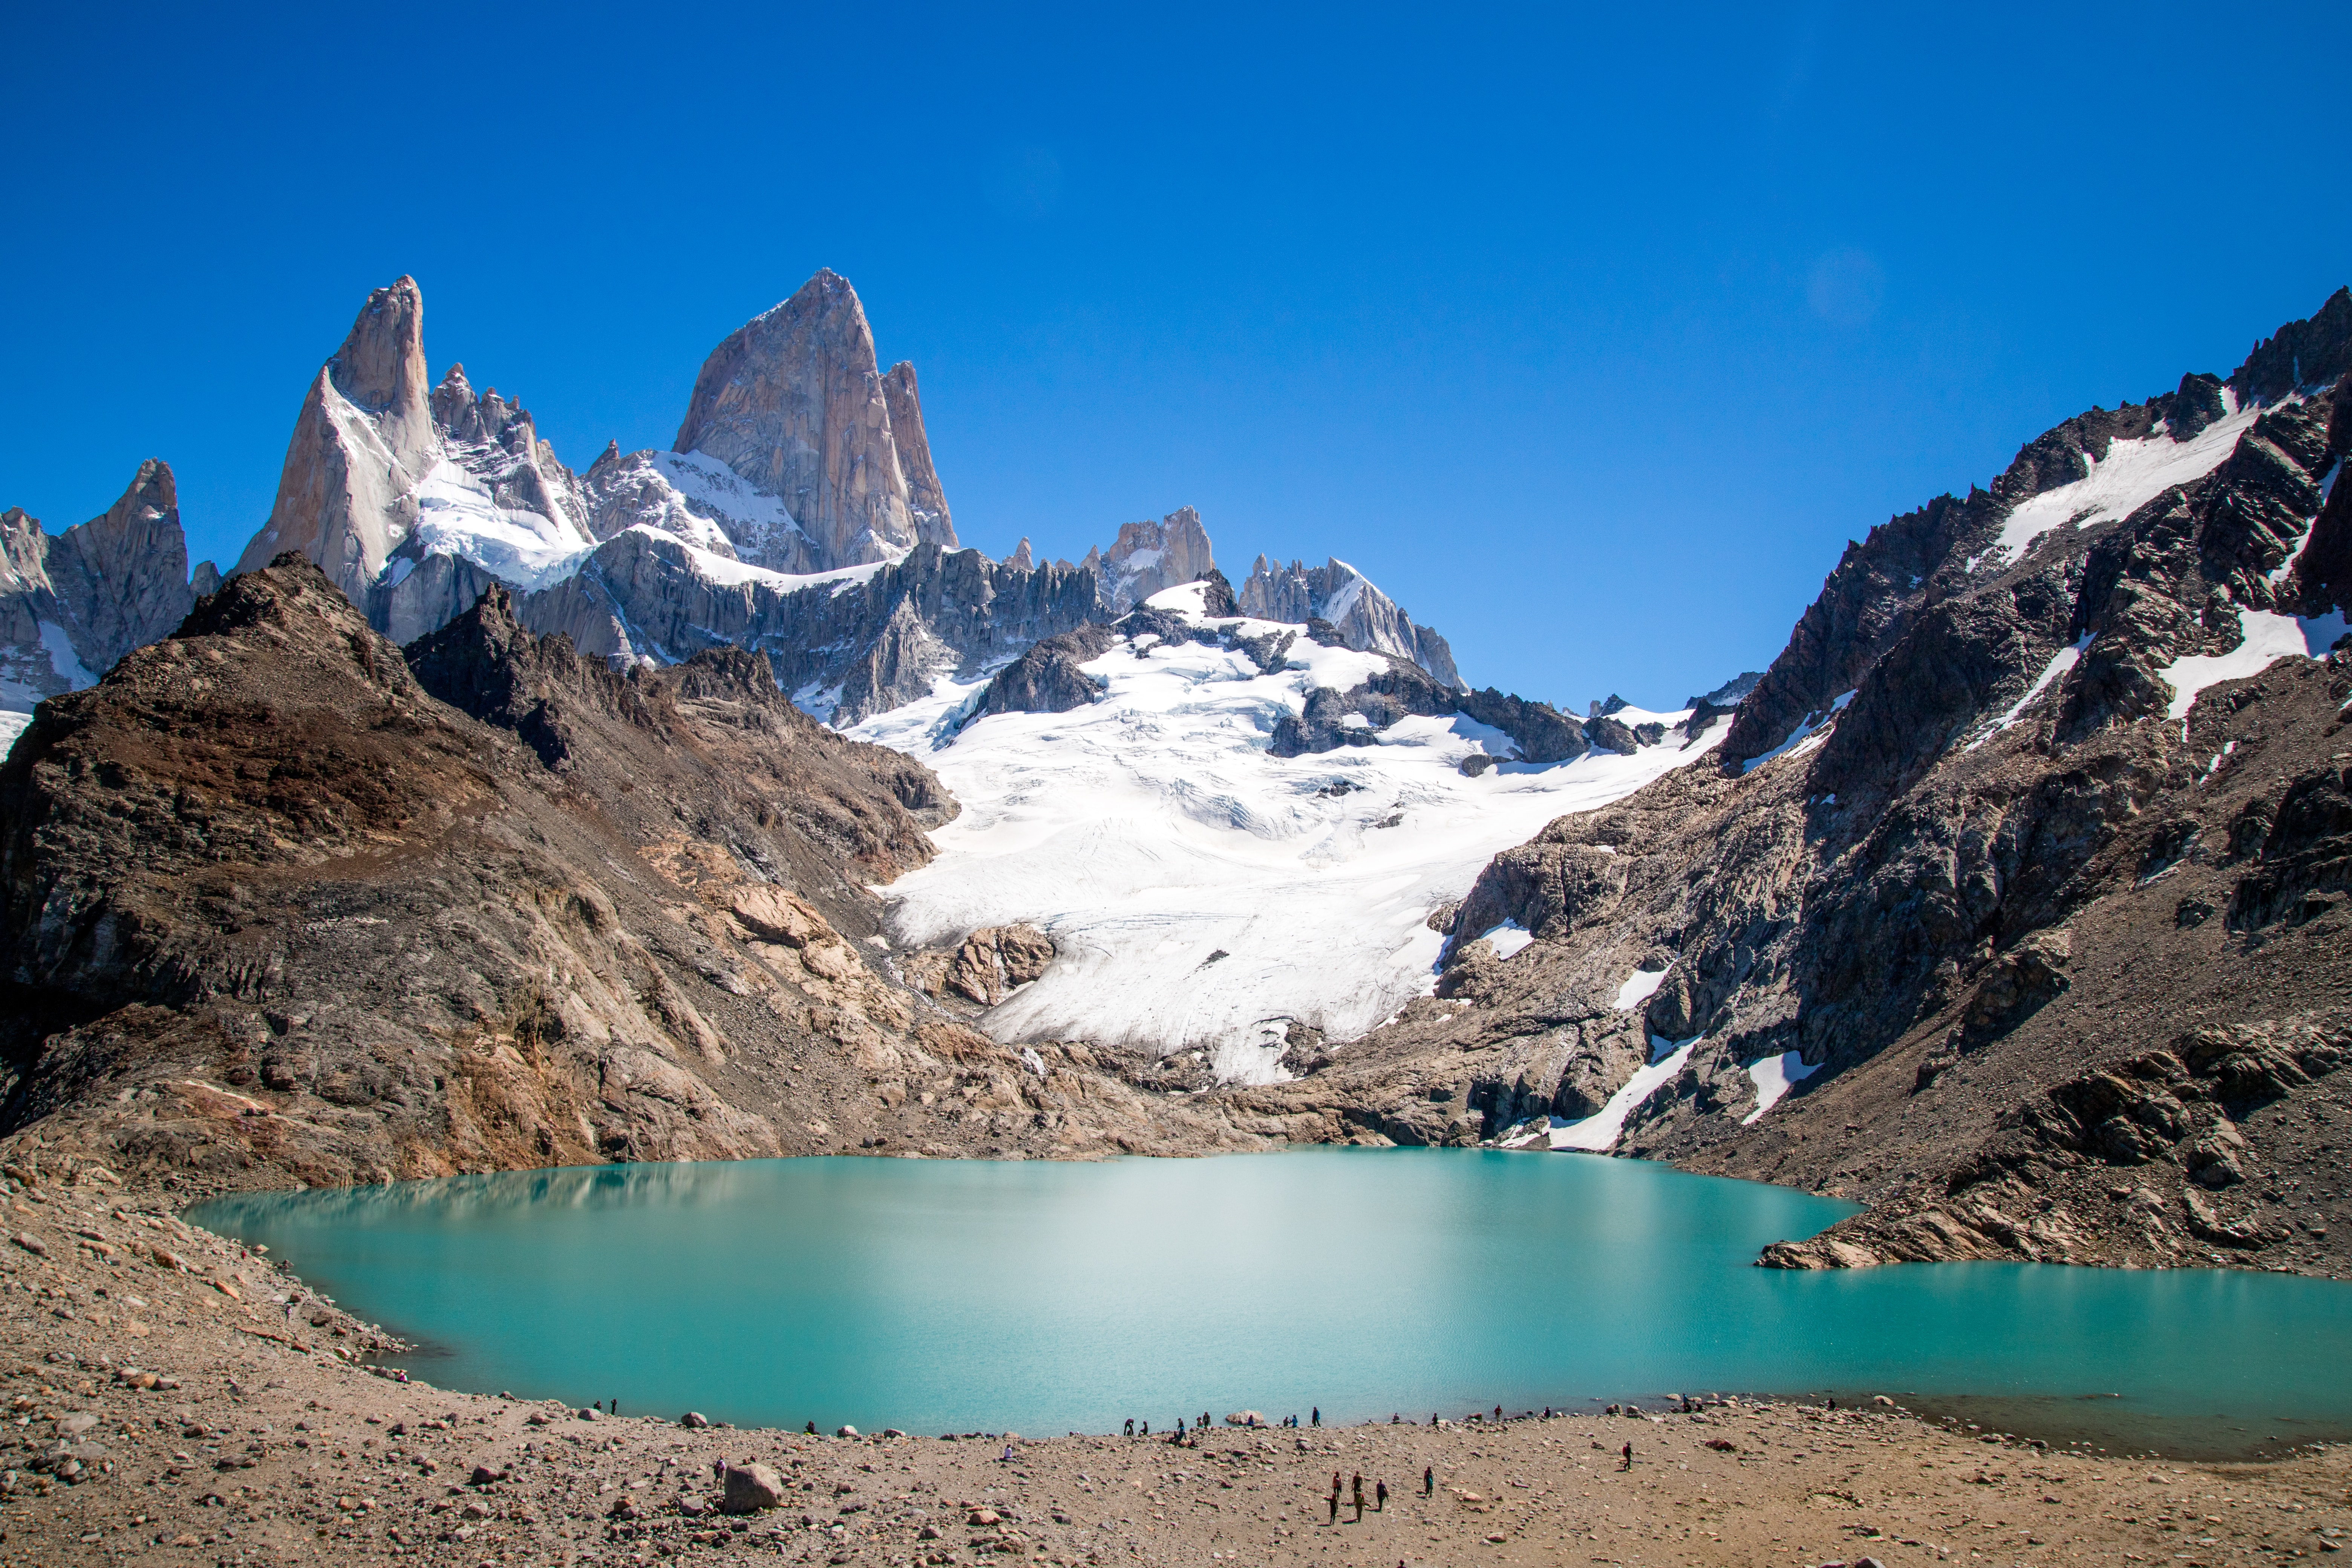 EL CHALTEN TRAVEL GUIDE: Patagonia Hiking Tips & Tricks